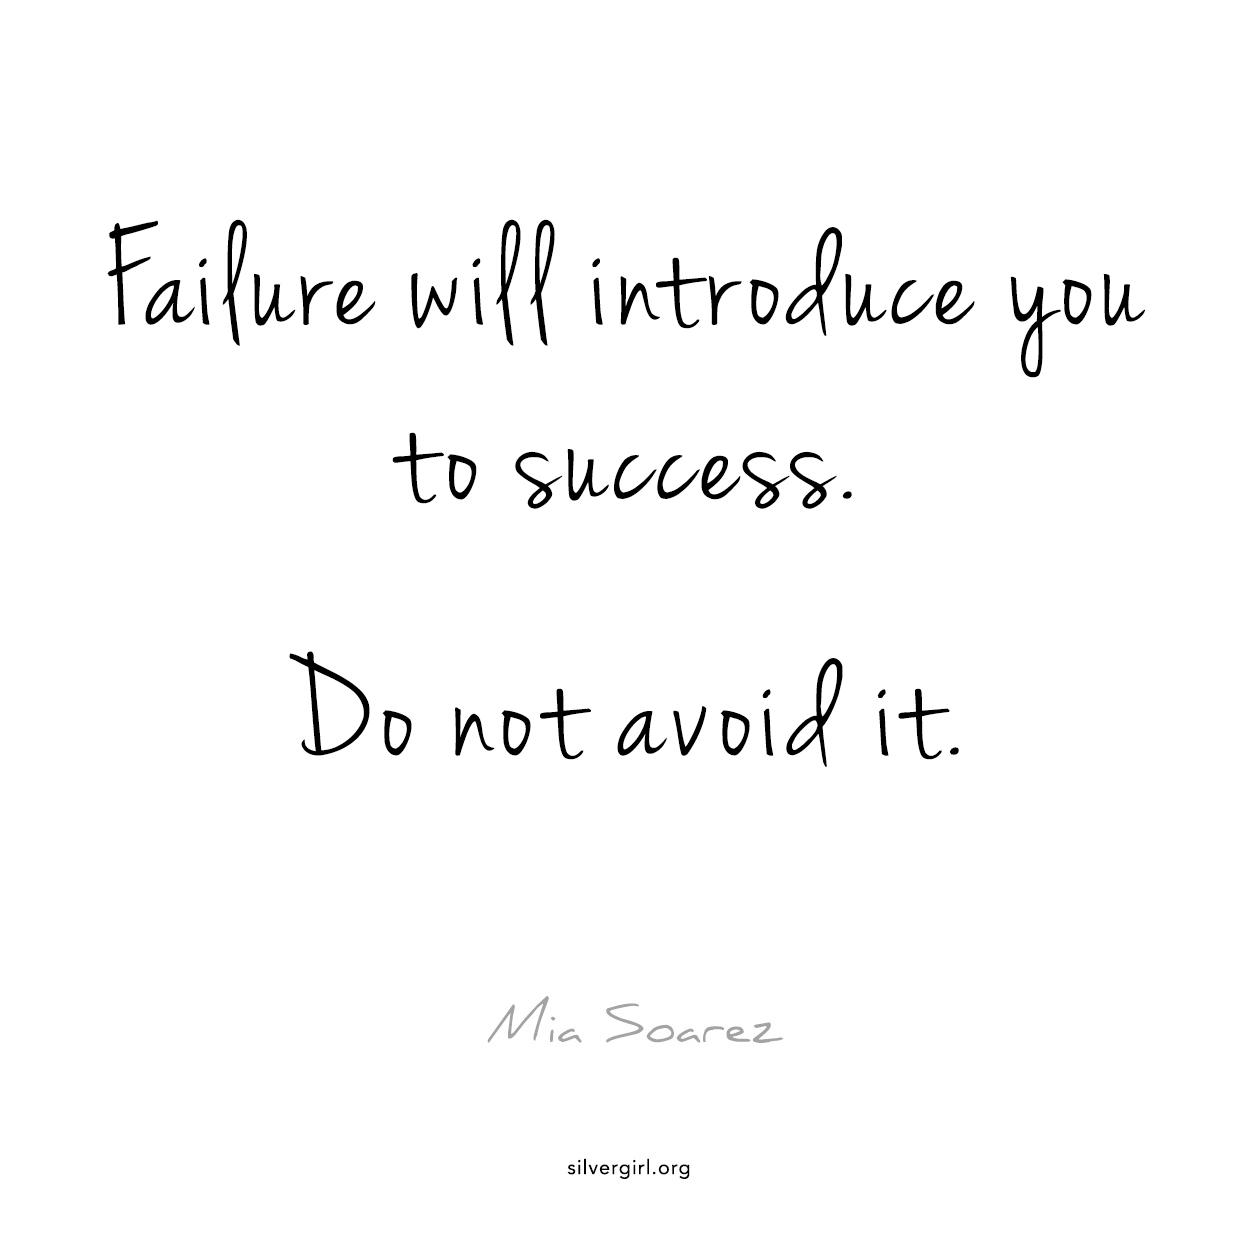 Failure will introduce you to success. Do not avoid it. - Mia Soarez